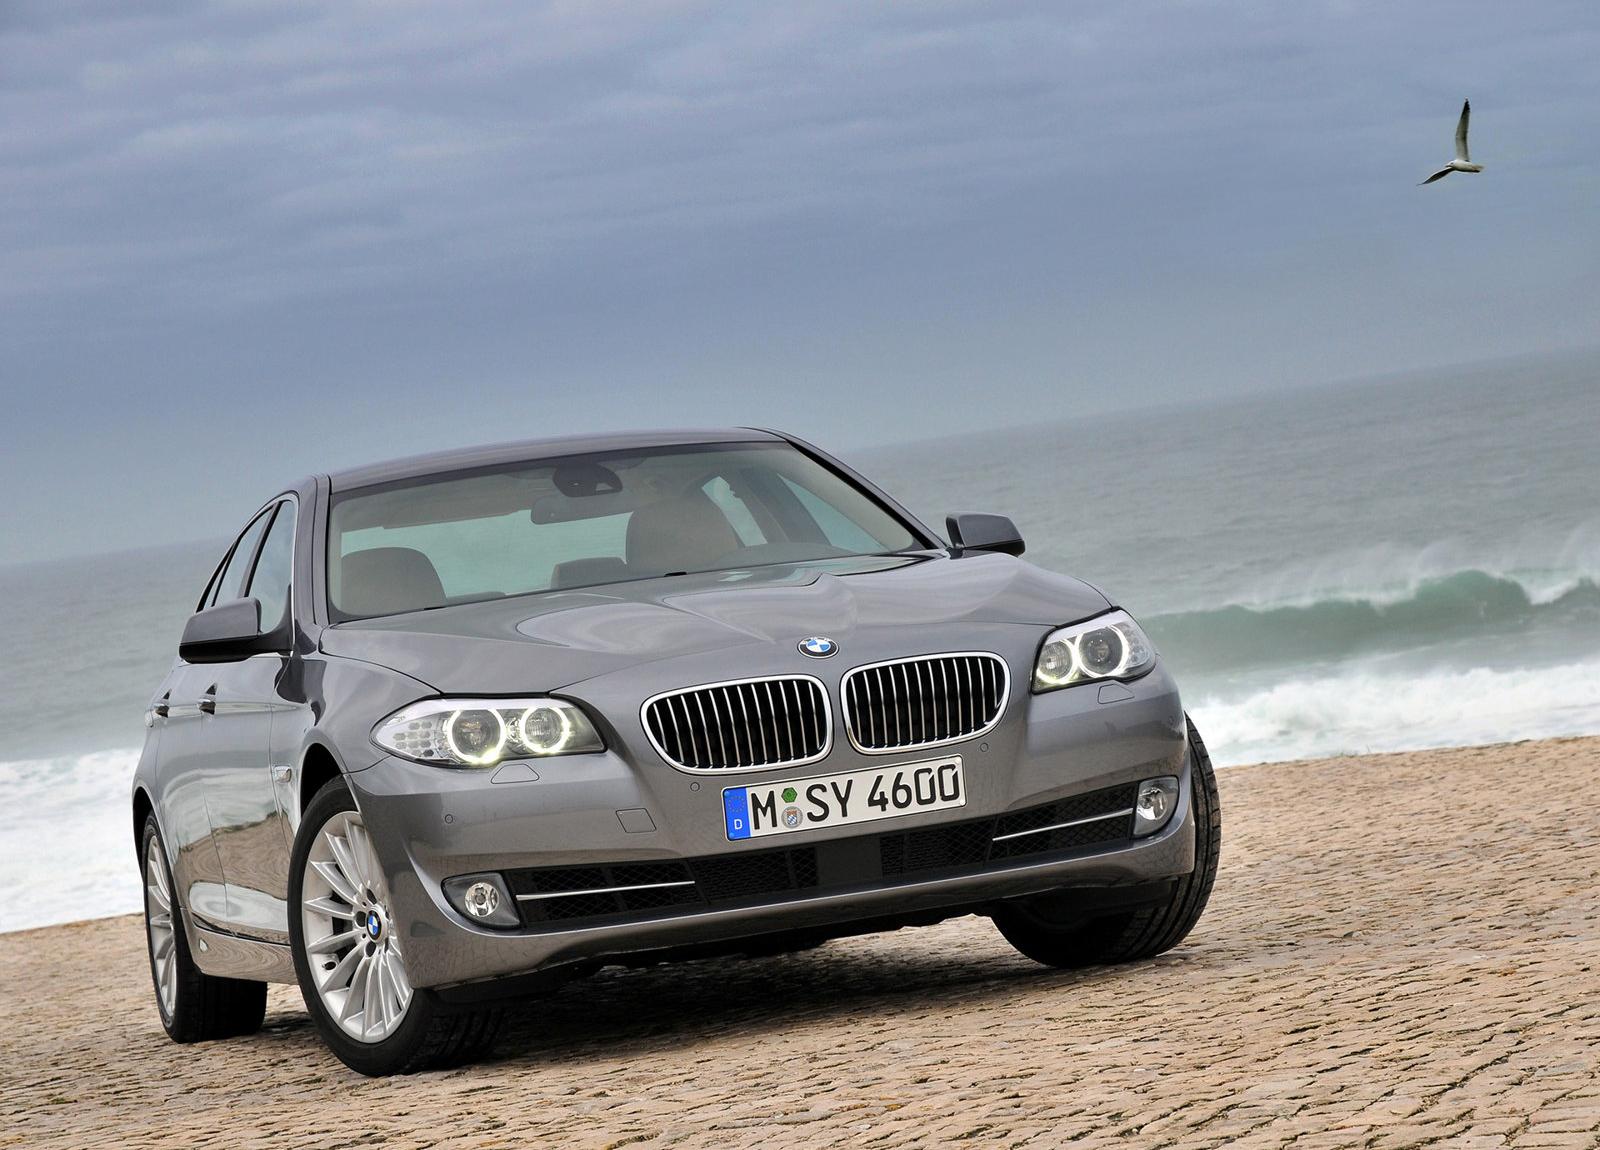 http://4.bp.blogspot.com/-efmICciu8Q0/UE33nIR9eNI/AAAAAAAAHQc/0HIwbatUSUc/s1600/BMW-5-Series_2011_1600x1200_wallpaper_0d.jpg